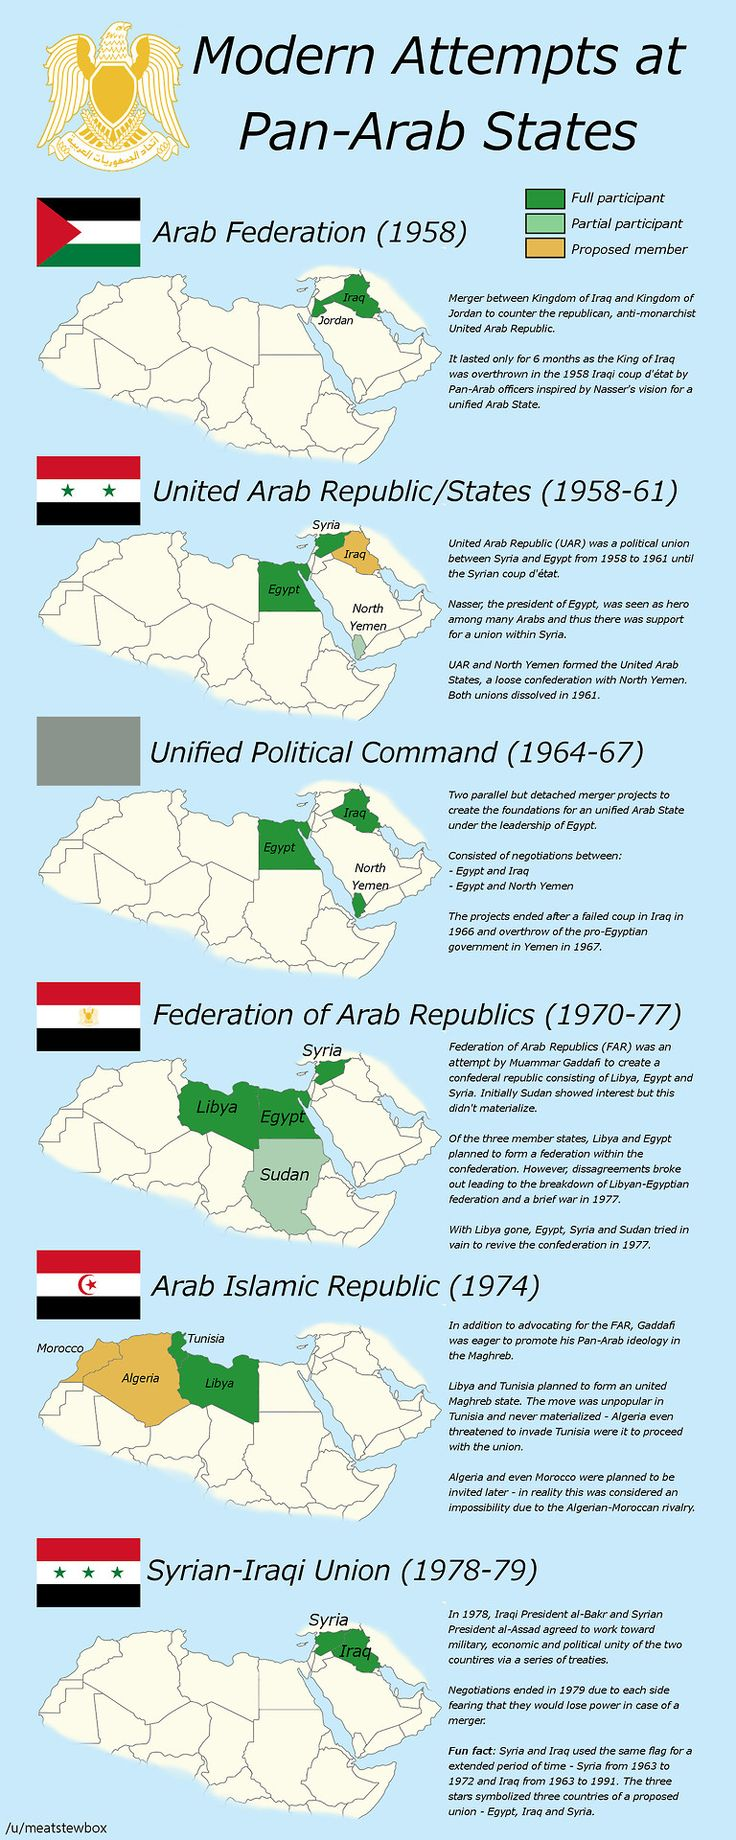 Modern attempts at Pan-Arab states.